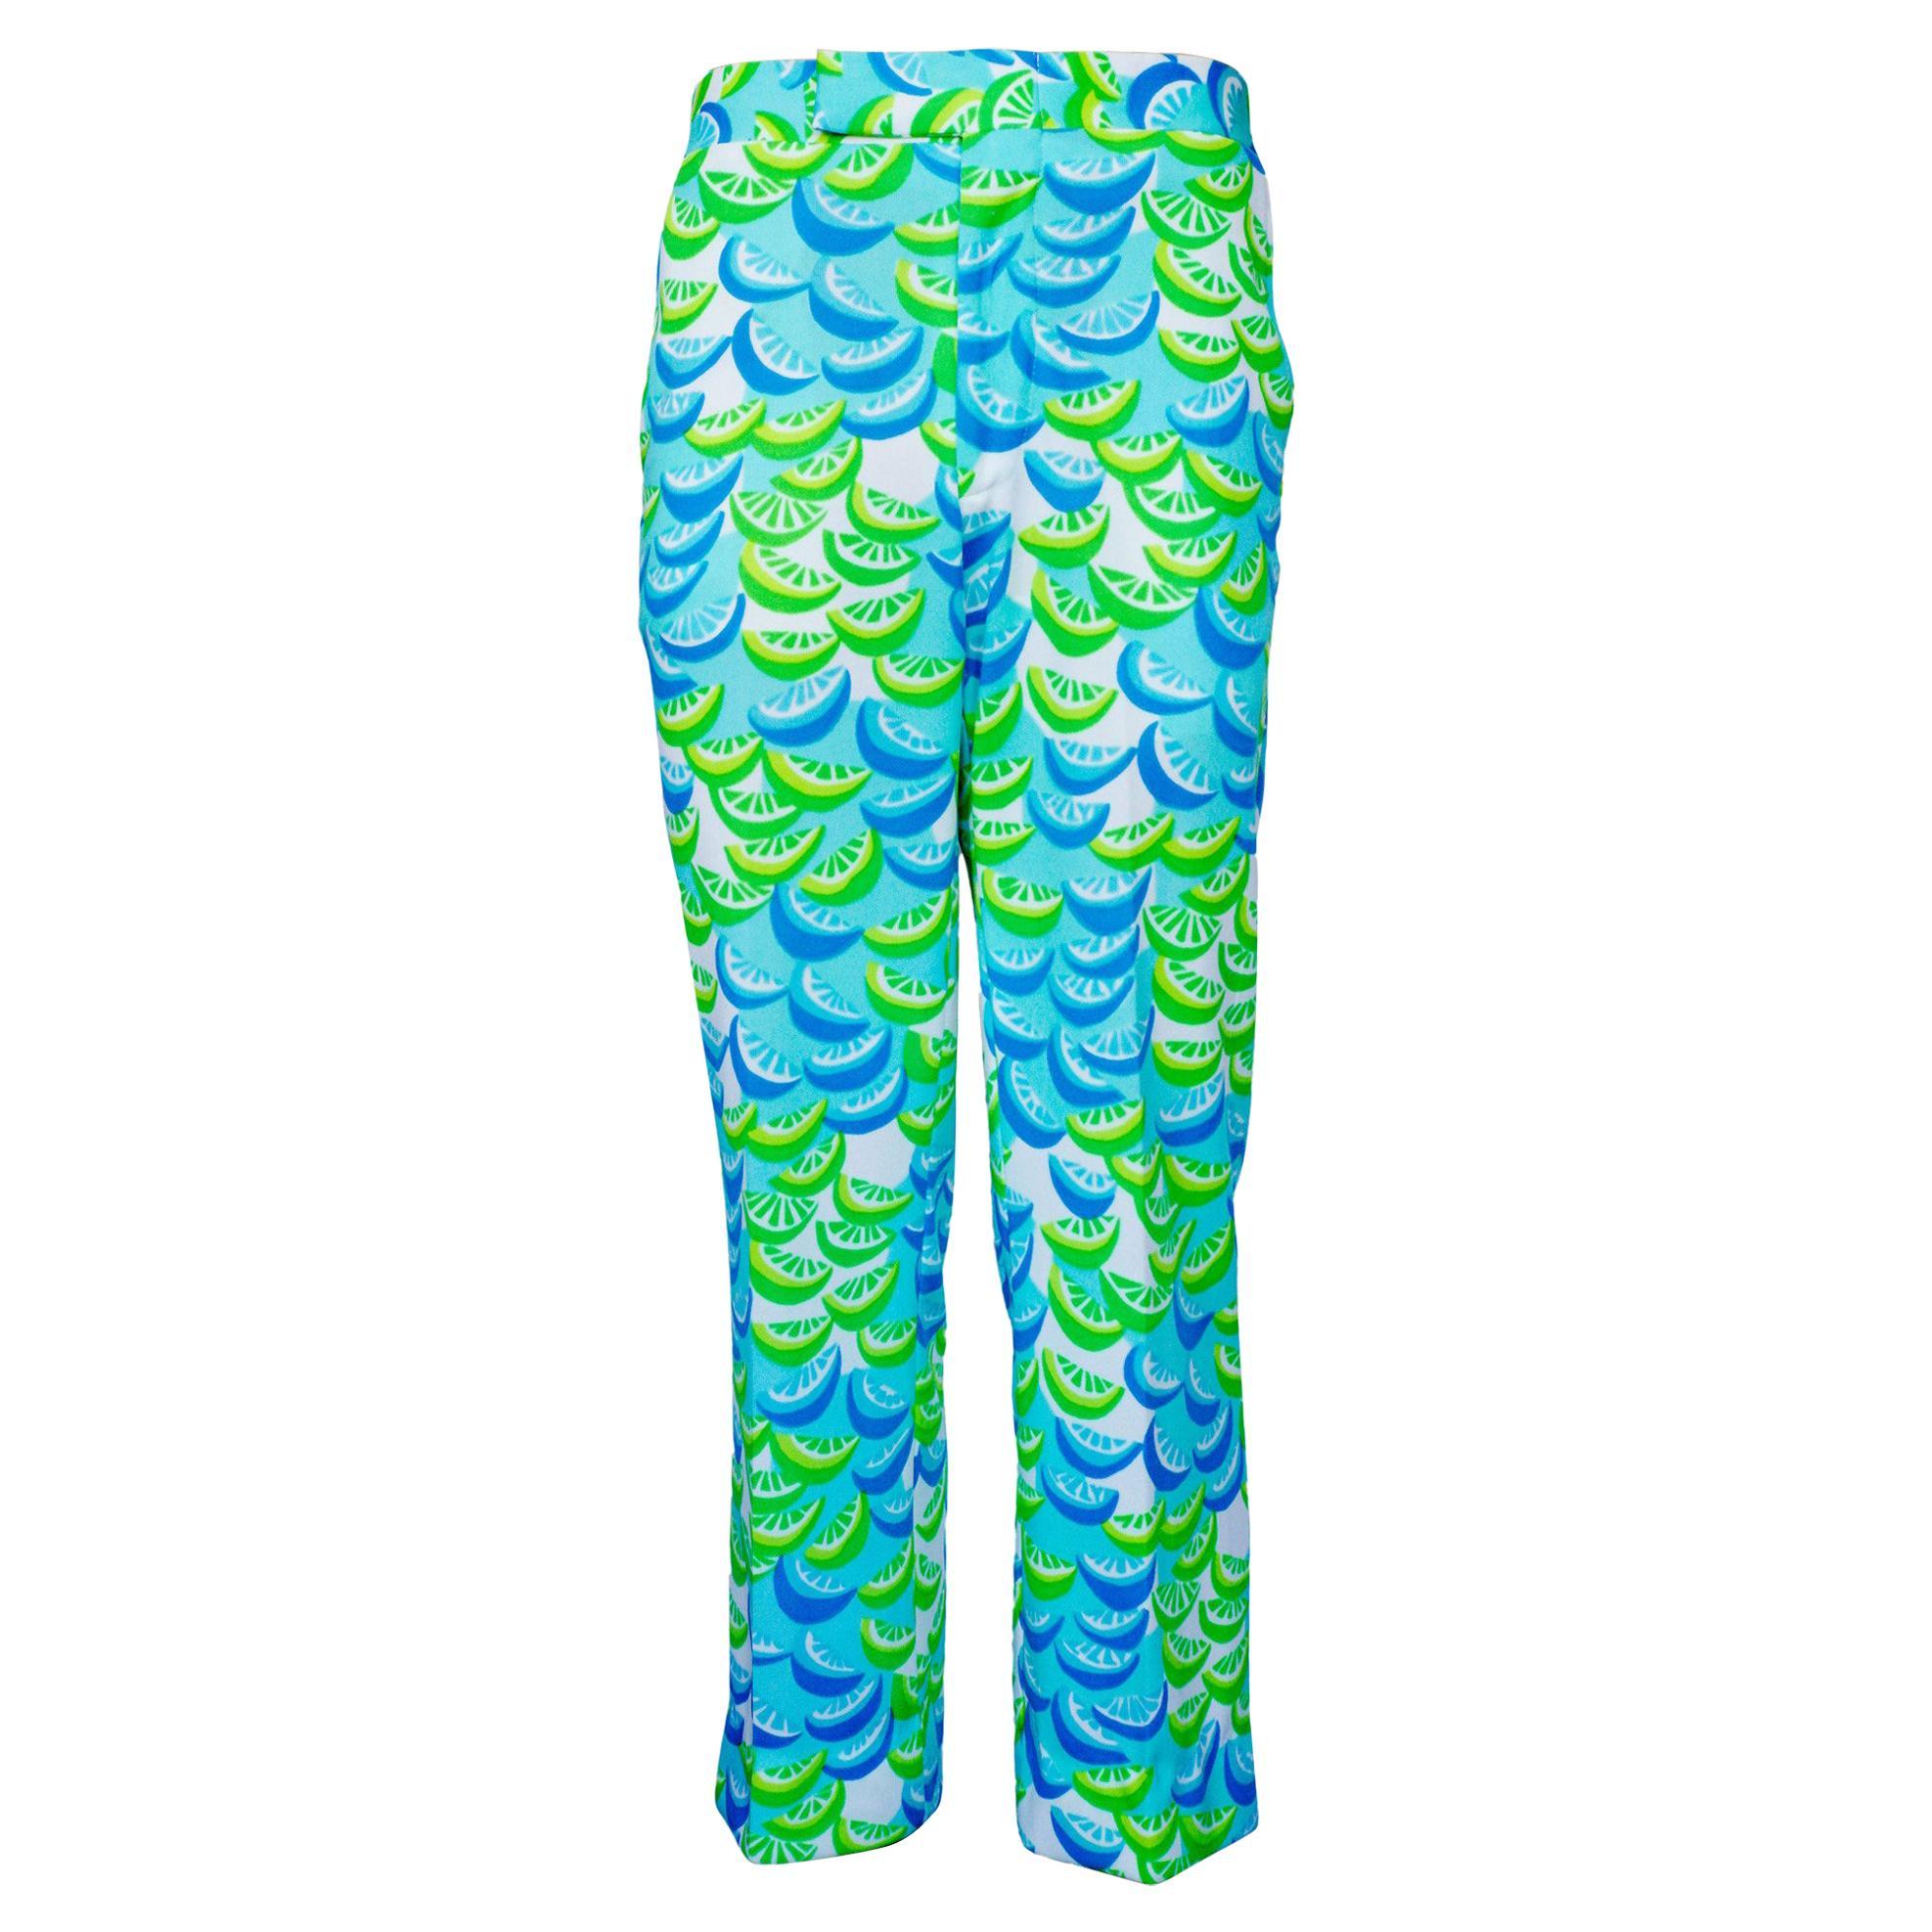 Lilly Pulitzer Citrus Pattern Golf Pants